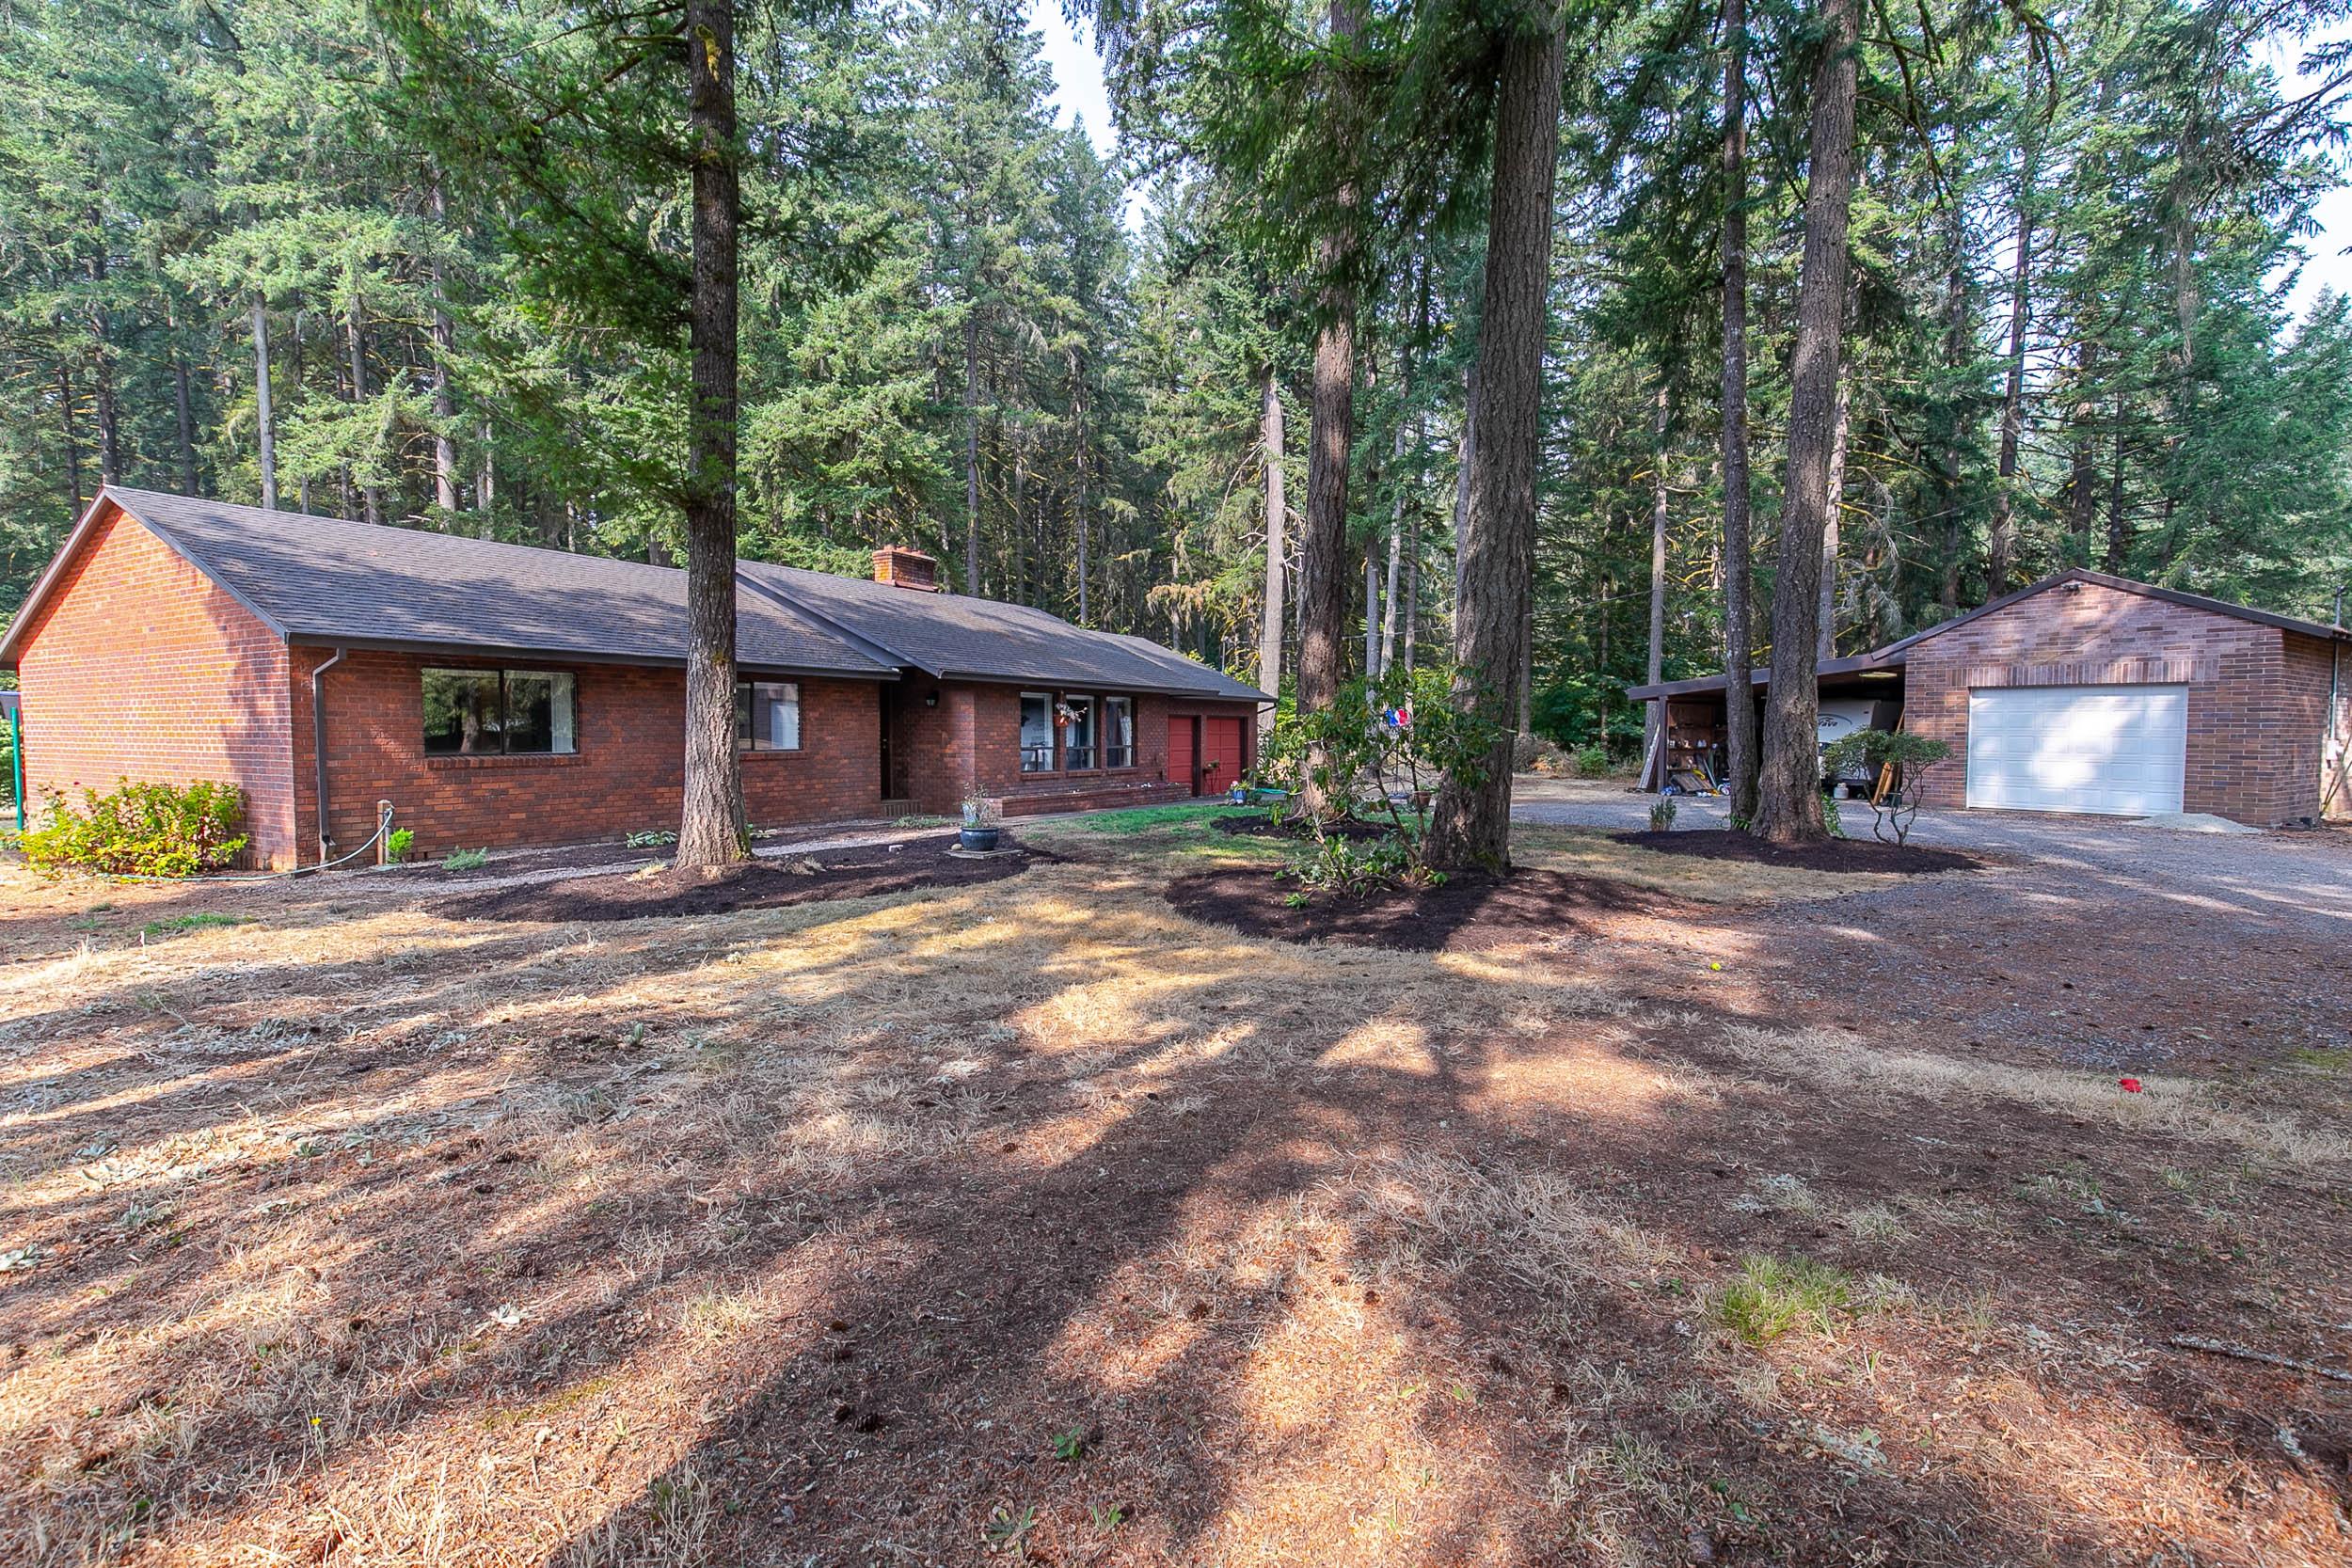 006_16181 S Eaden Rd Oregon City_MG_6625-HDR.jpg